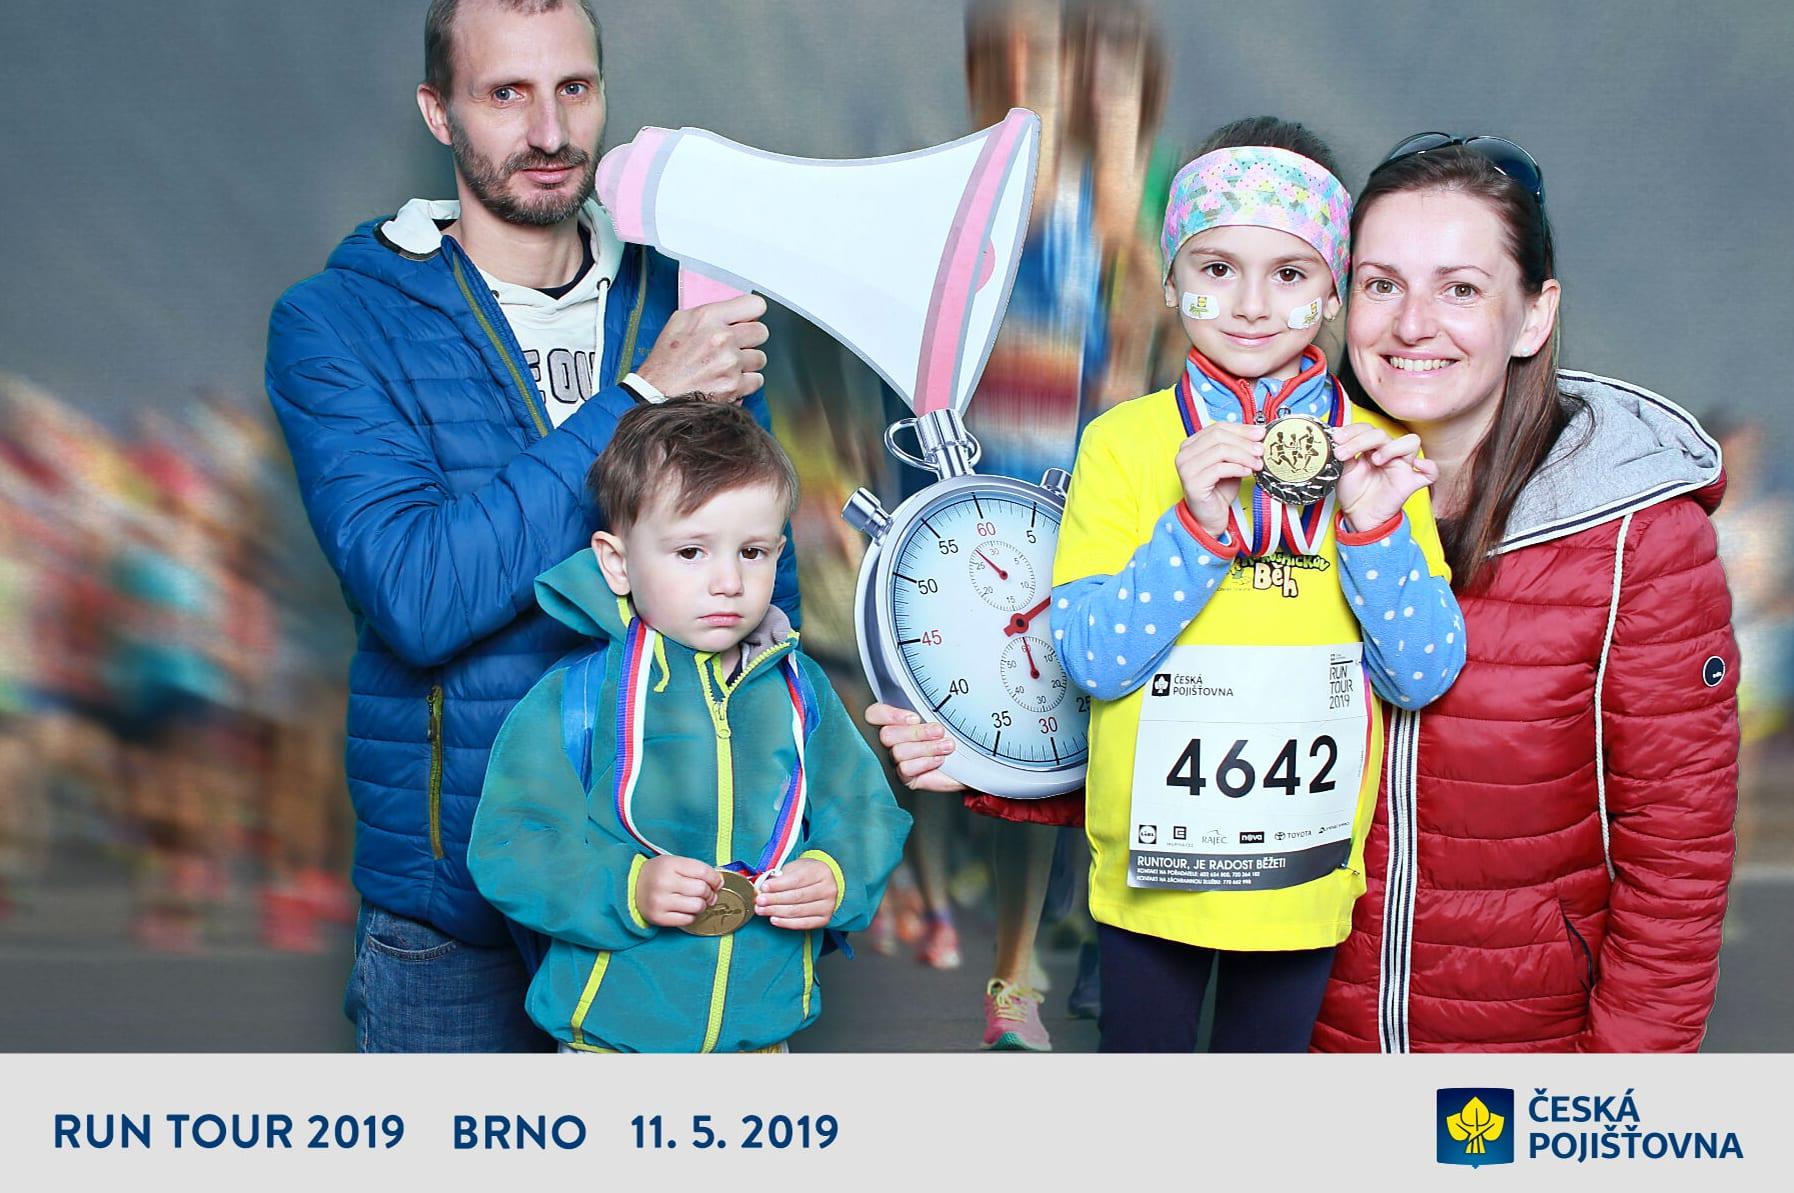 fotokoutek-ceska-pojistovna-run-tour-2019-11-5-2019-604675